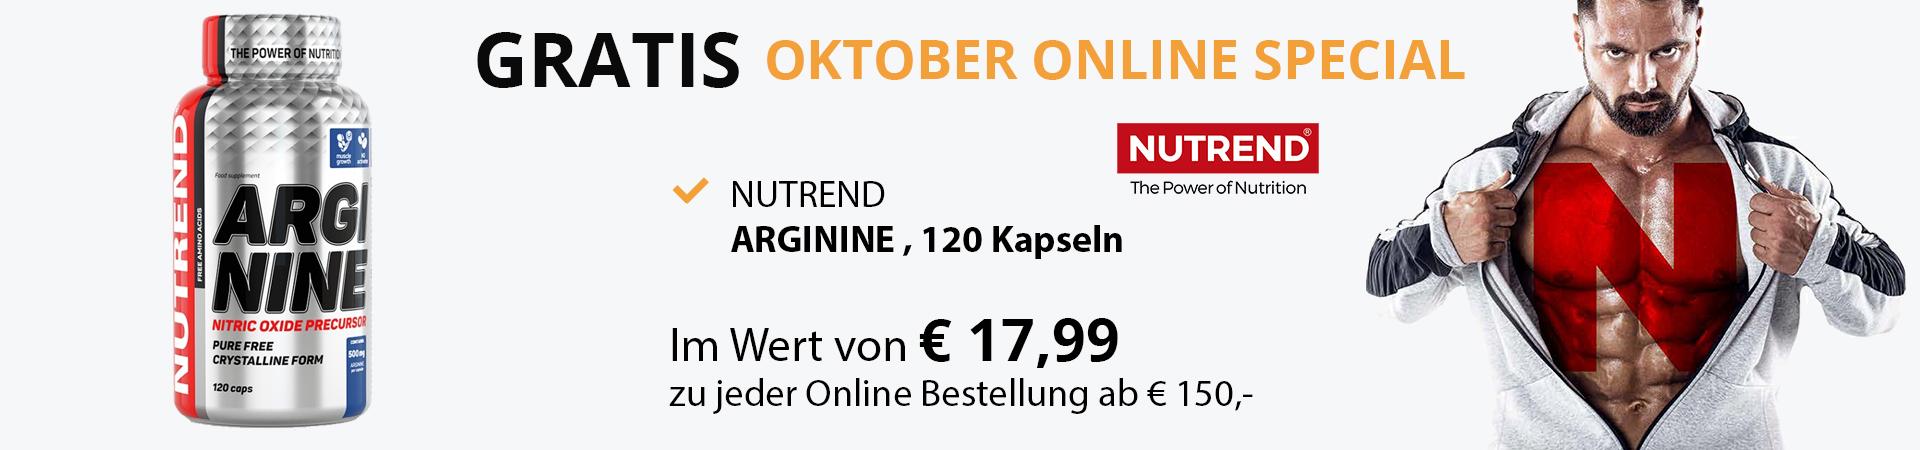 Oktober Online Special